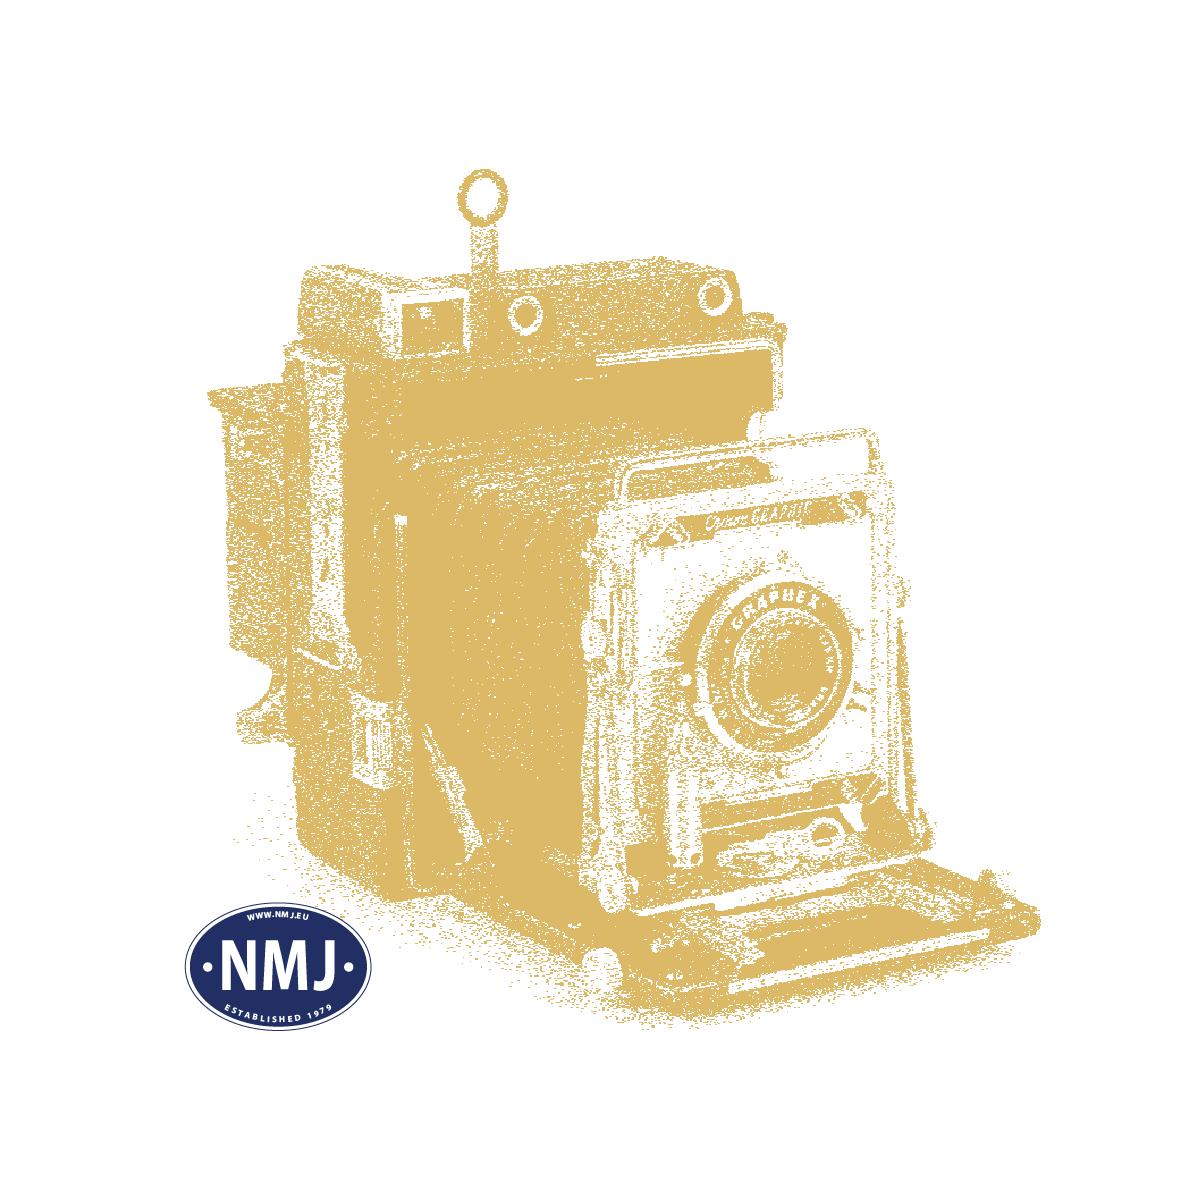 NOC17572 - Syklist m/ lys